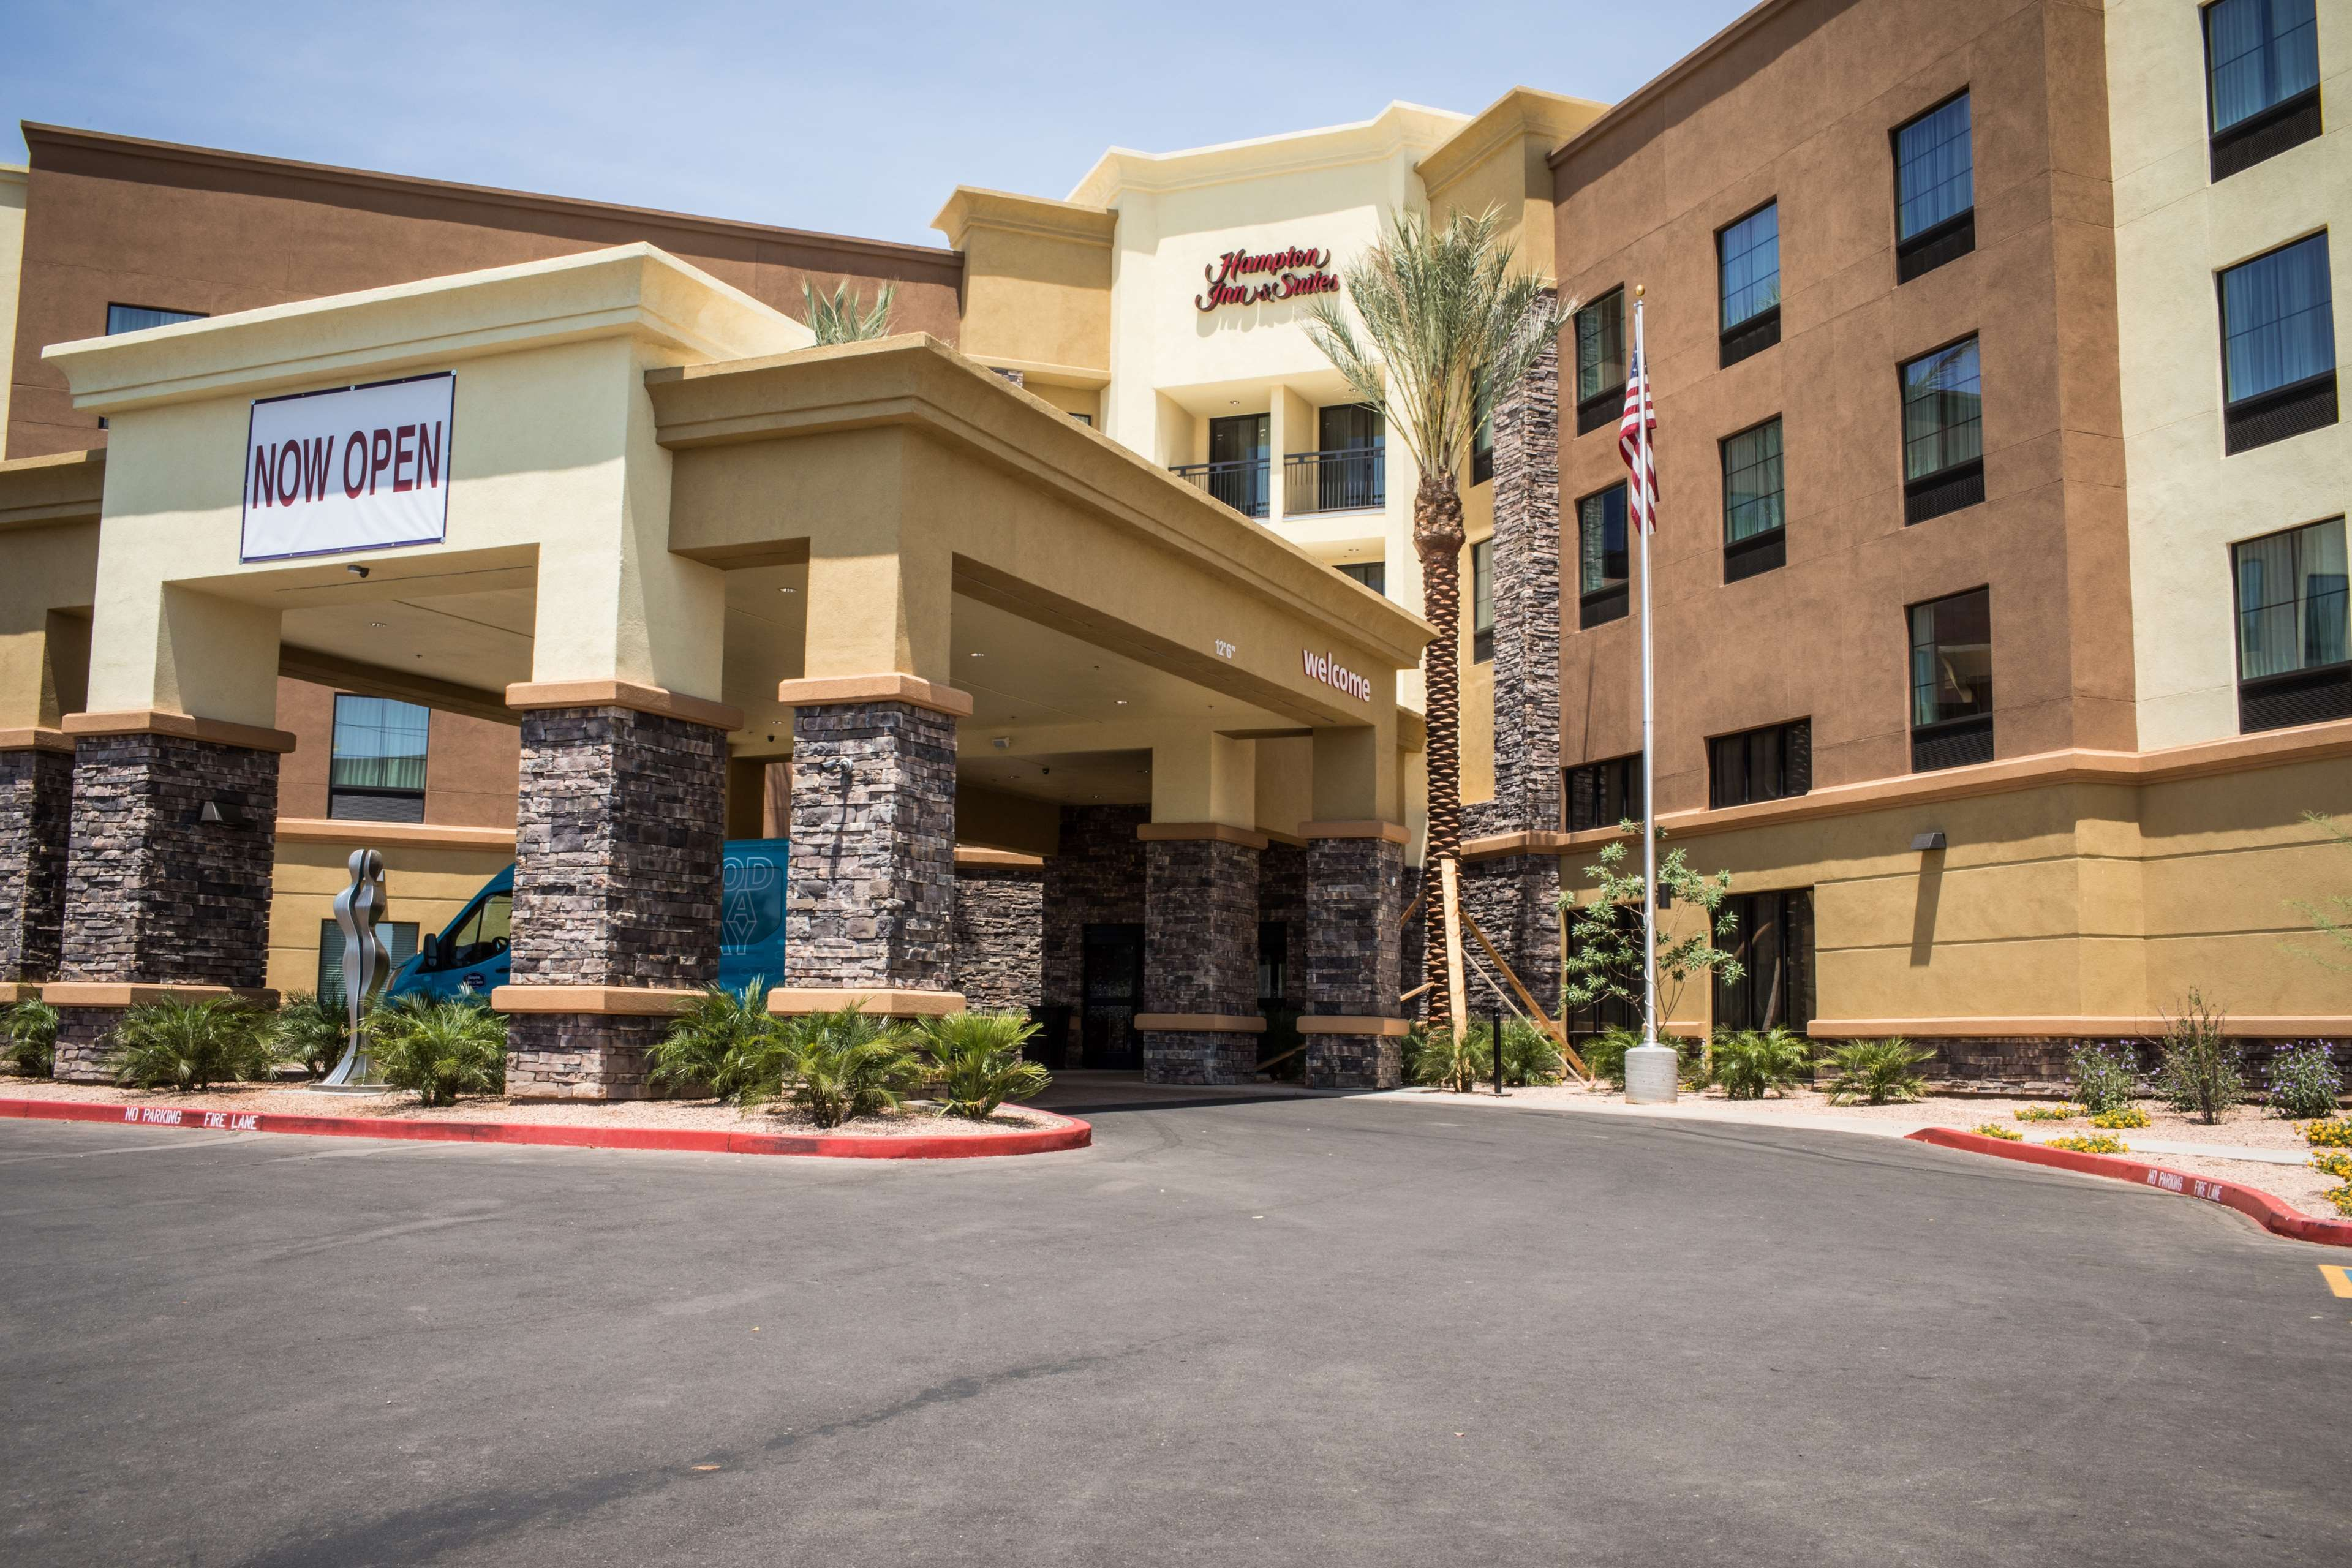 Hampton Inn & Suites Tempe - Phoenix Airport image 1